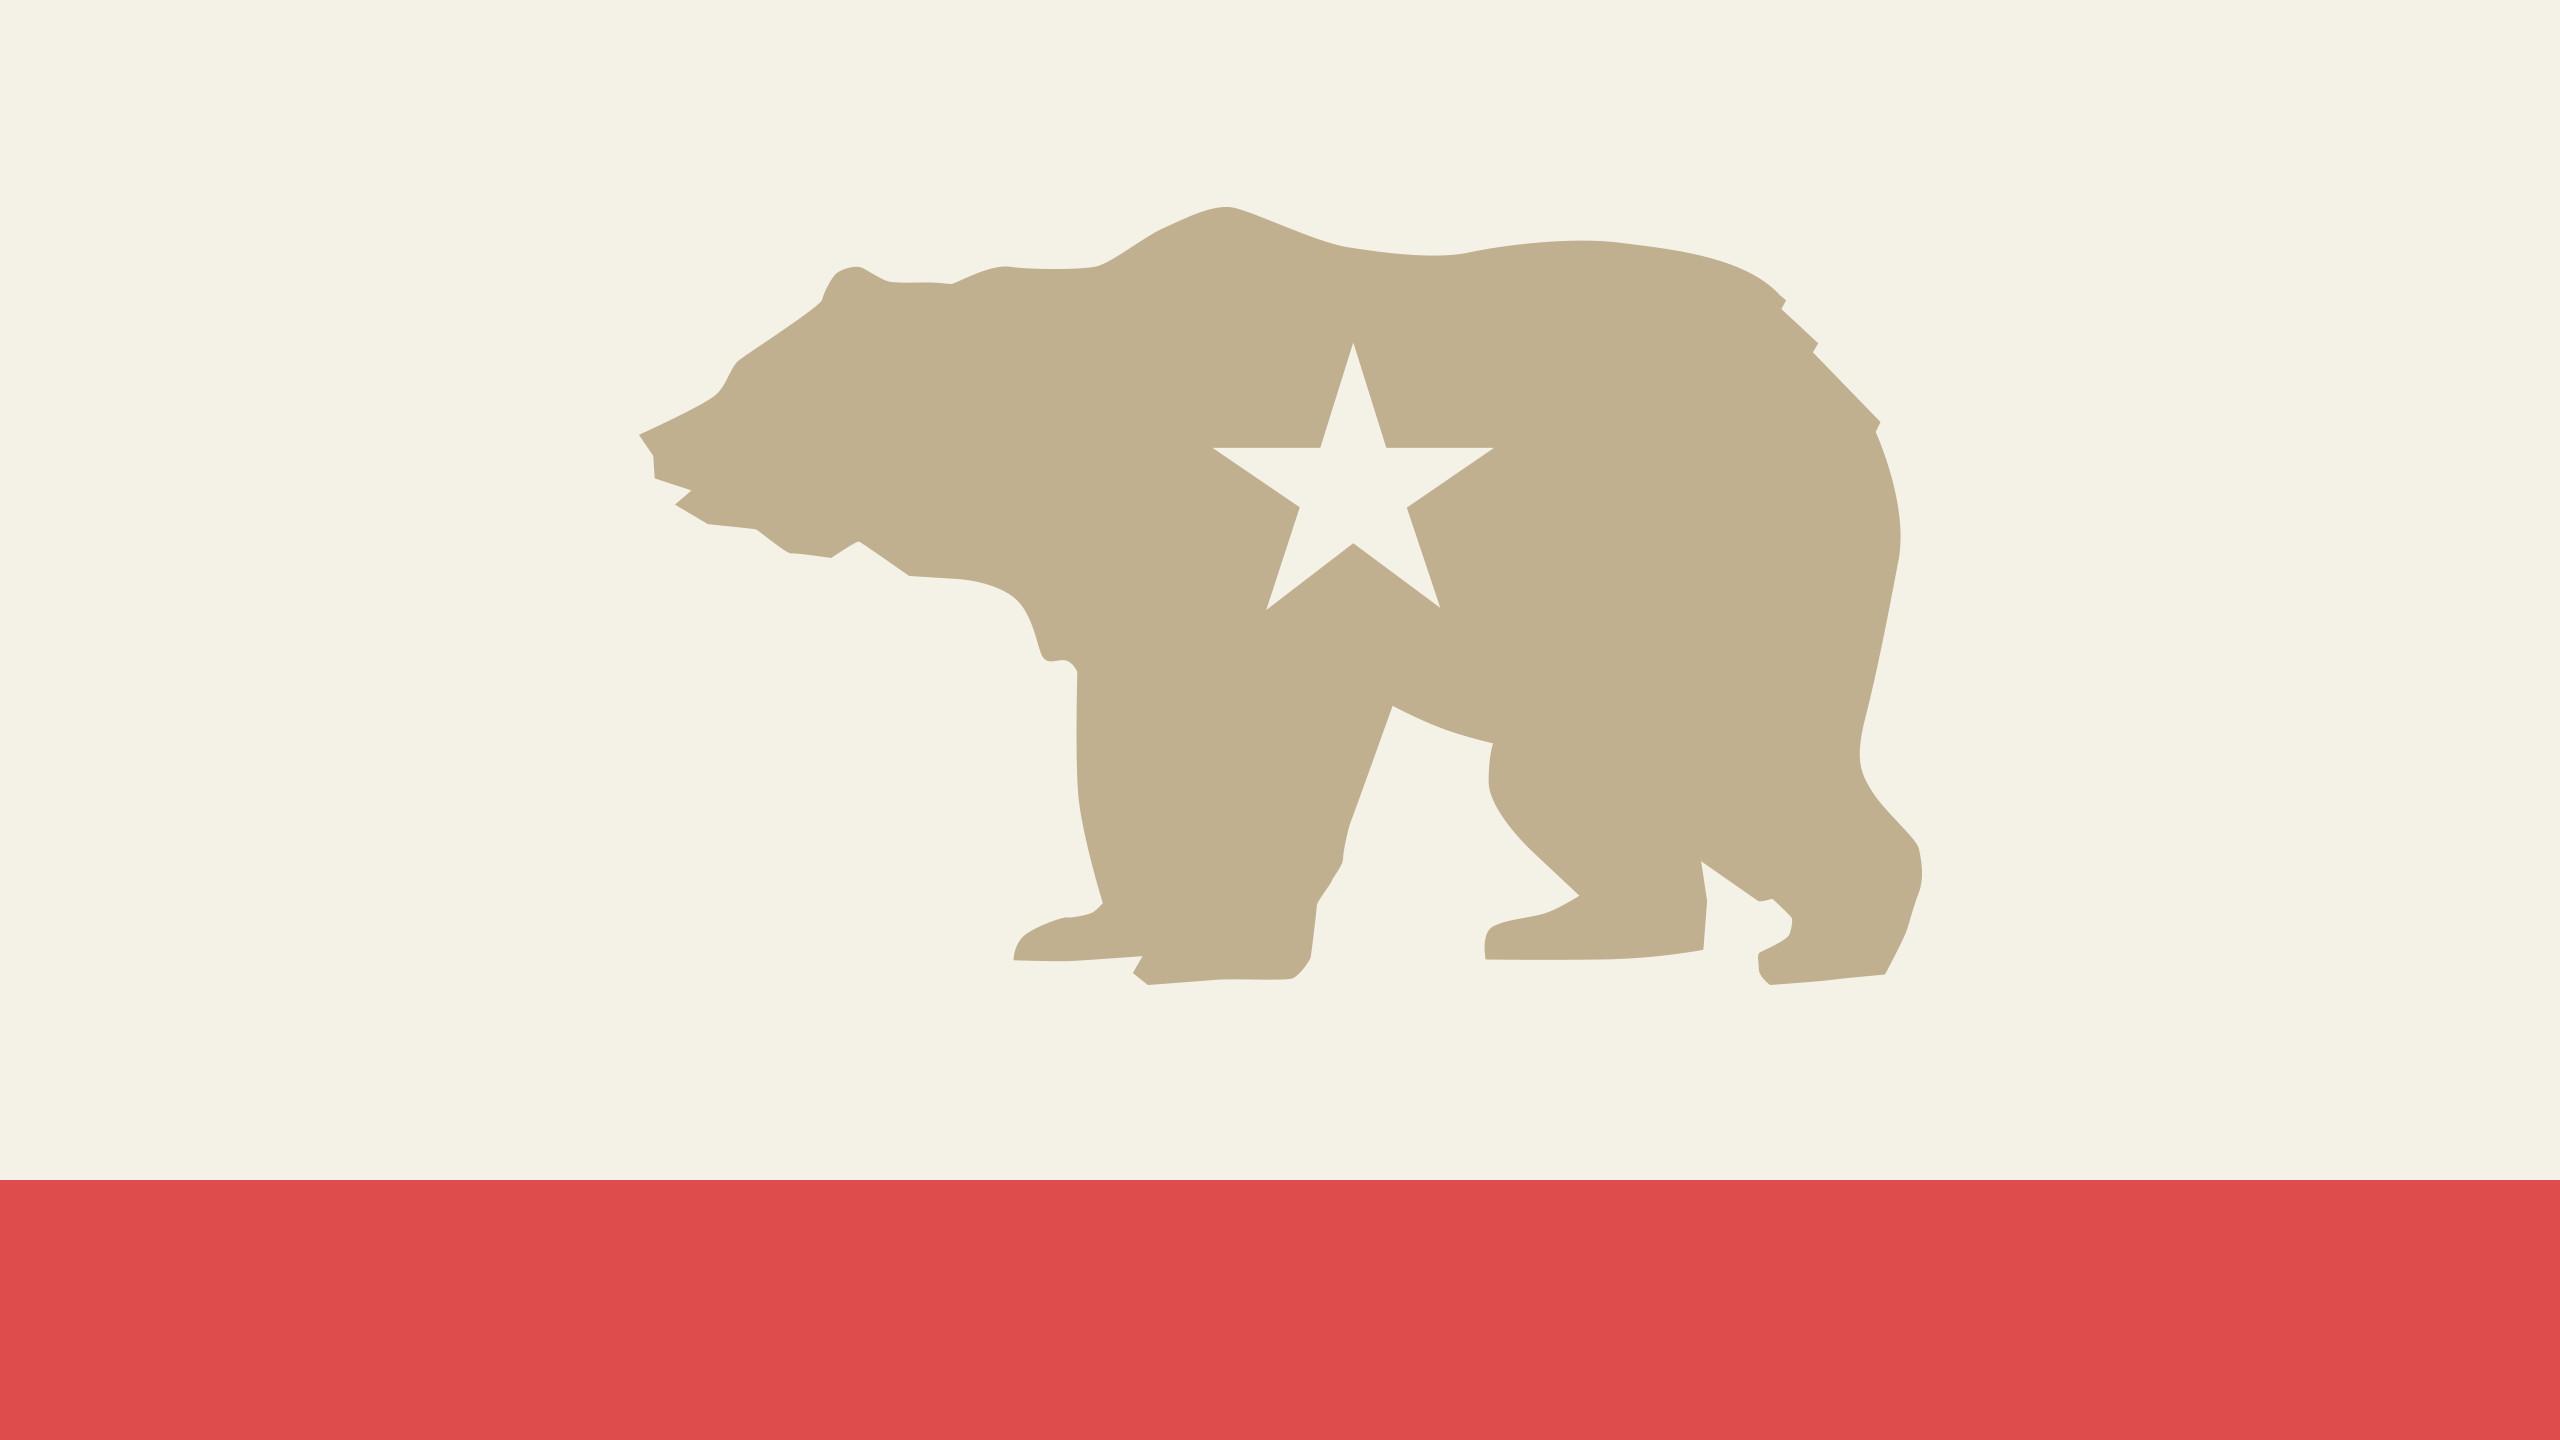 California State Flag Wallpaper